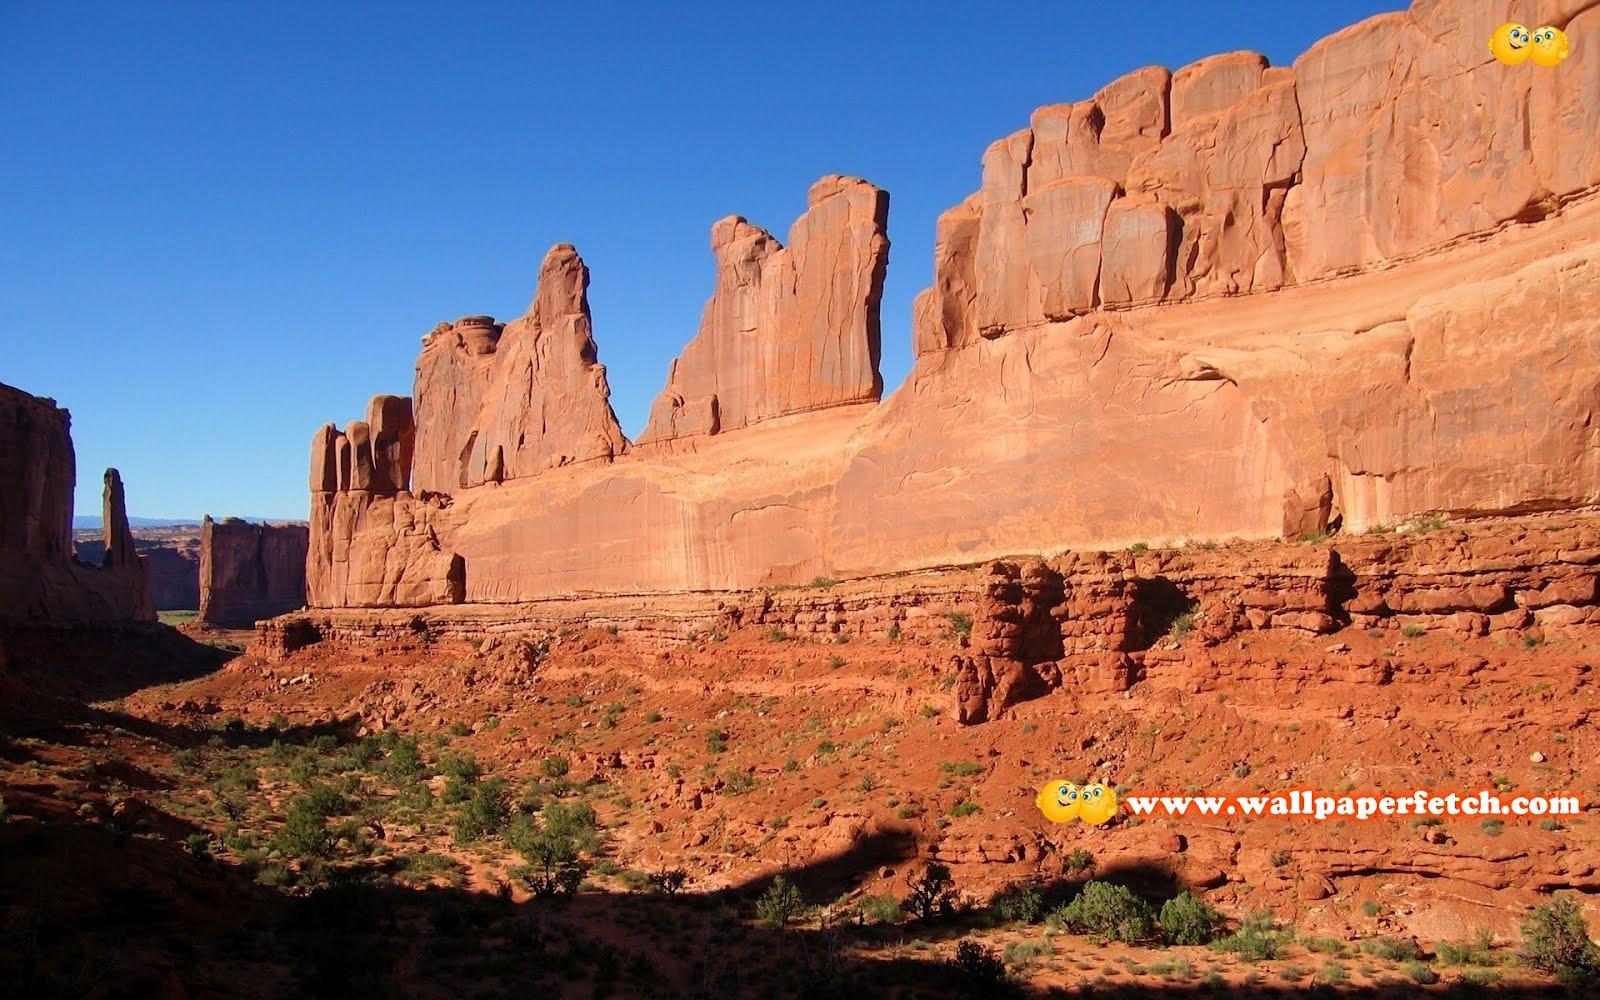 http://4.bp.blogspot.com/-EynrYECMdGg/T1SiC6niRZI/AAAAAAAANww/uaJybhzyh6Y/s1600/arches-national-park-10187-1920x1200.jpg